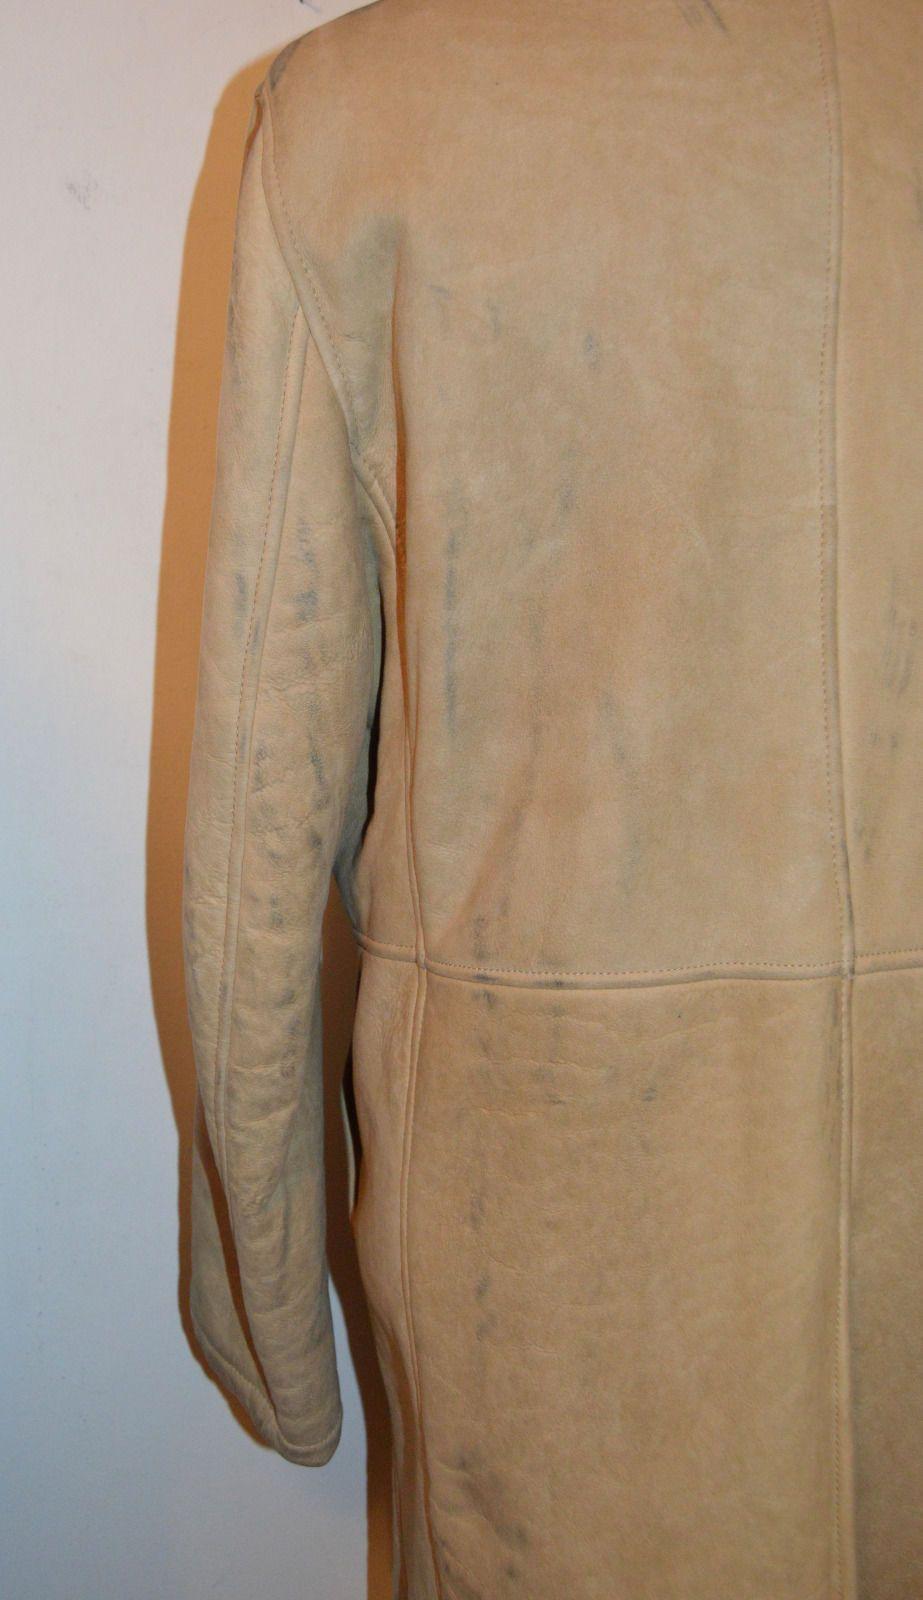 e750971b421df Vintage Helmut Lang A w 04 05 Shearling Camel Runway Coat Sz Sz 52 Large